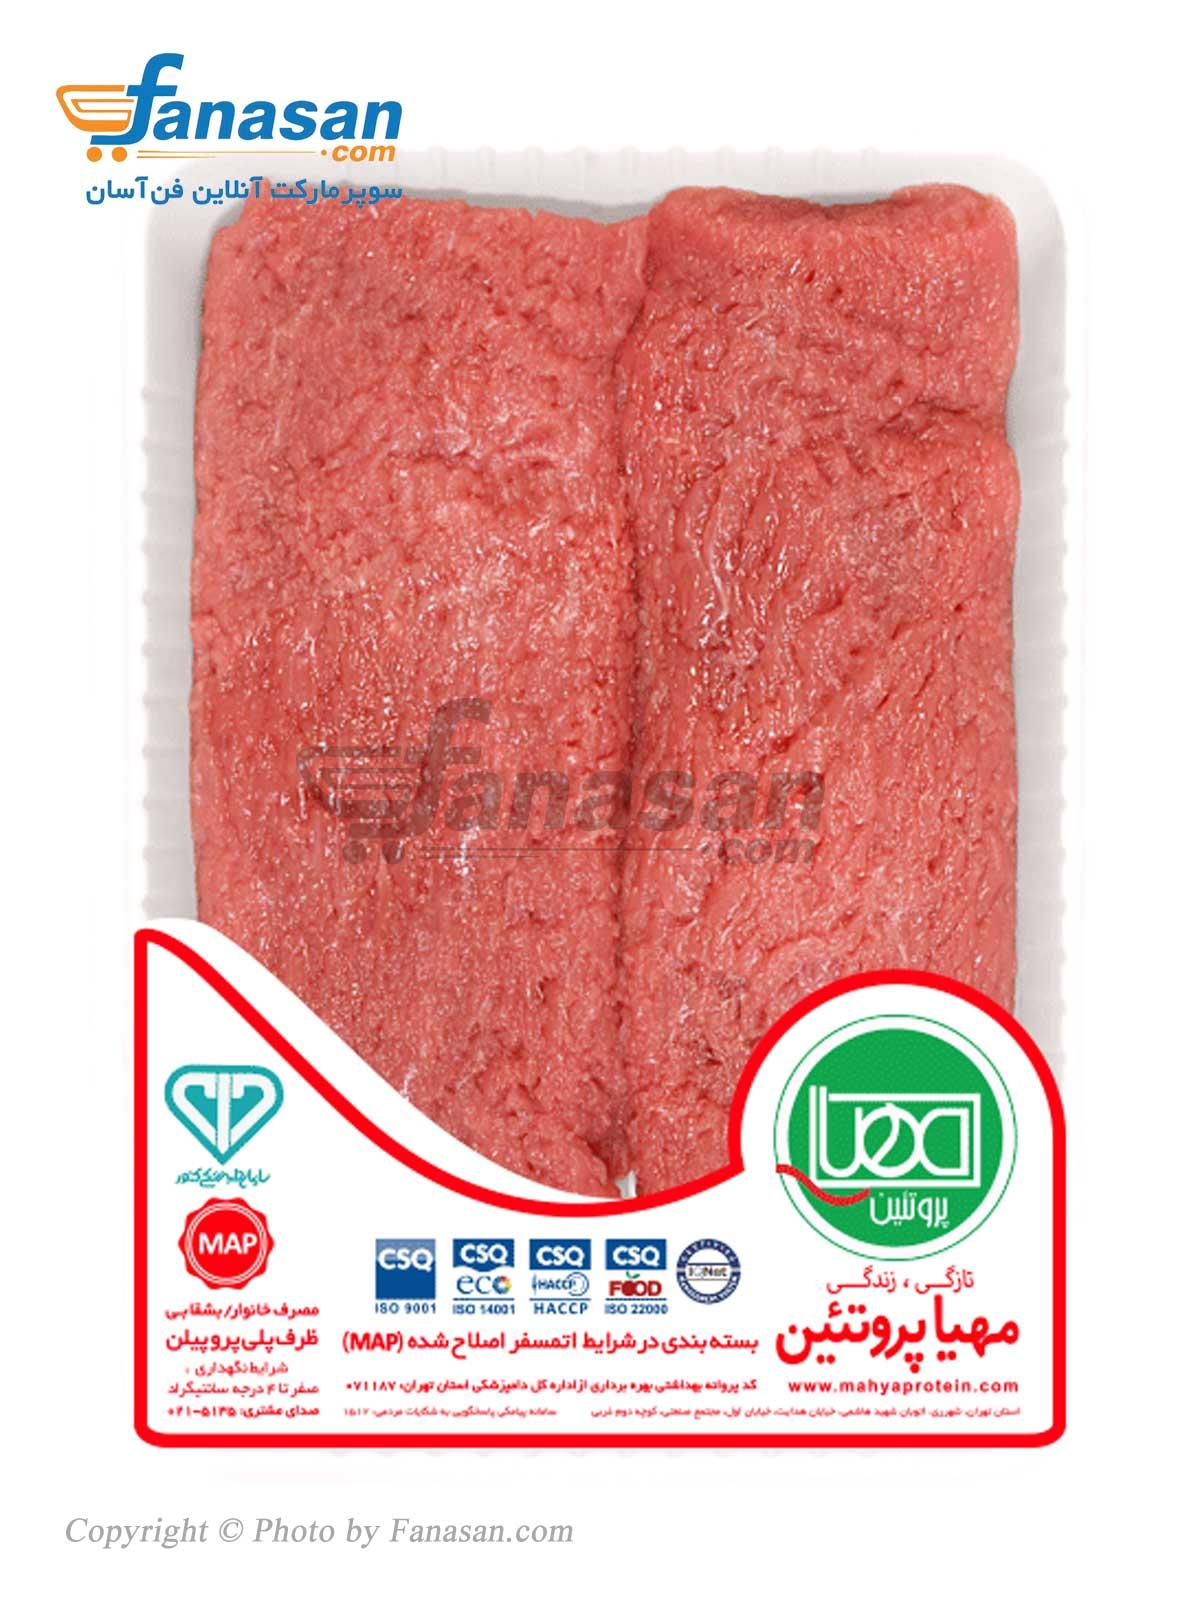 استیک گوساله مهیا پروتئین 500 گرم